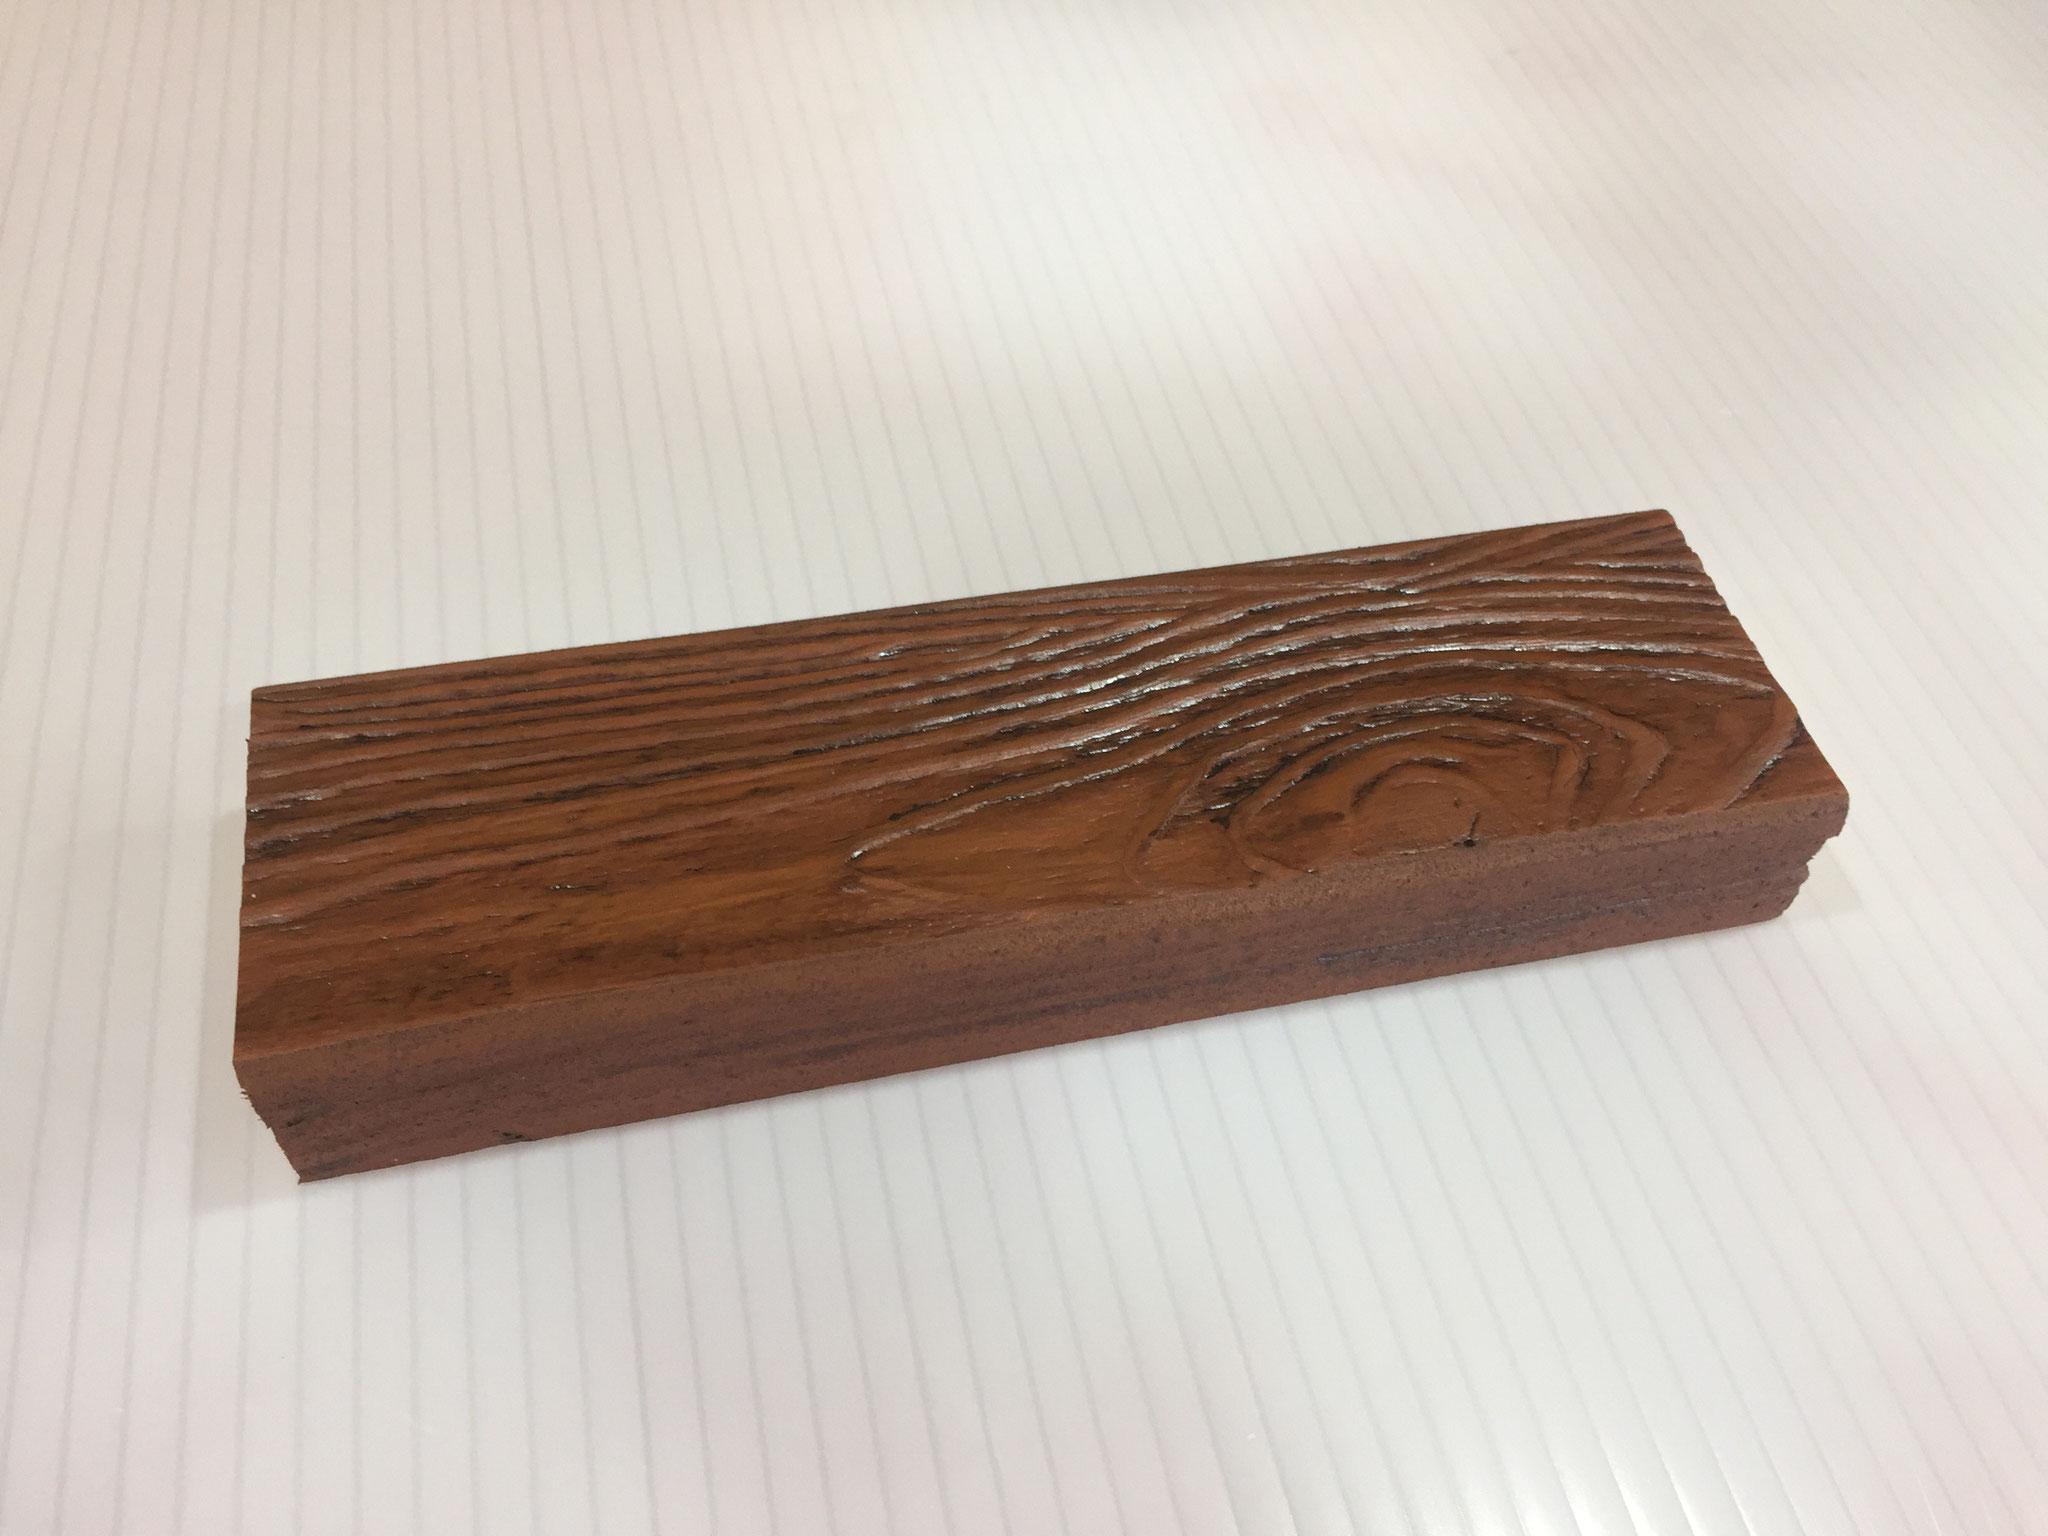 Vigas decorativas imitacion madera trasdos sl - Paneles imitacion madera ...